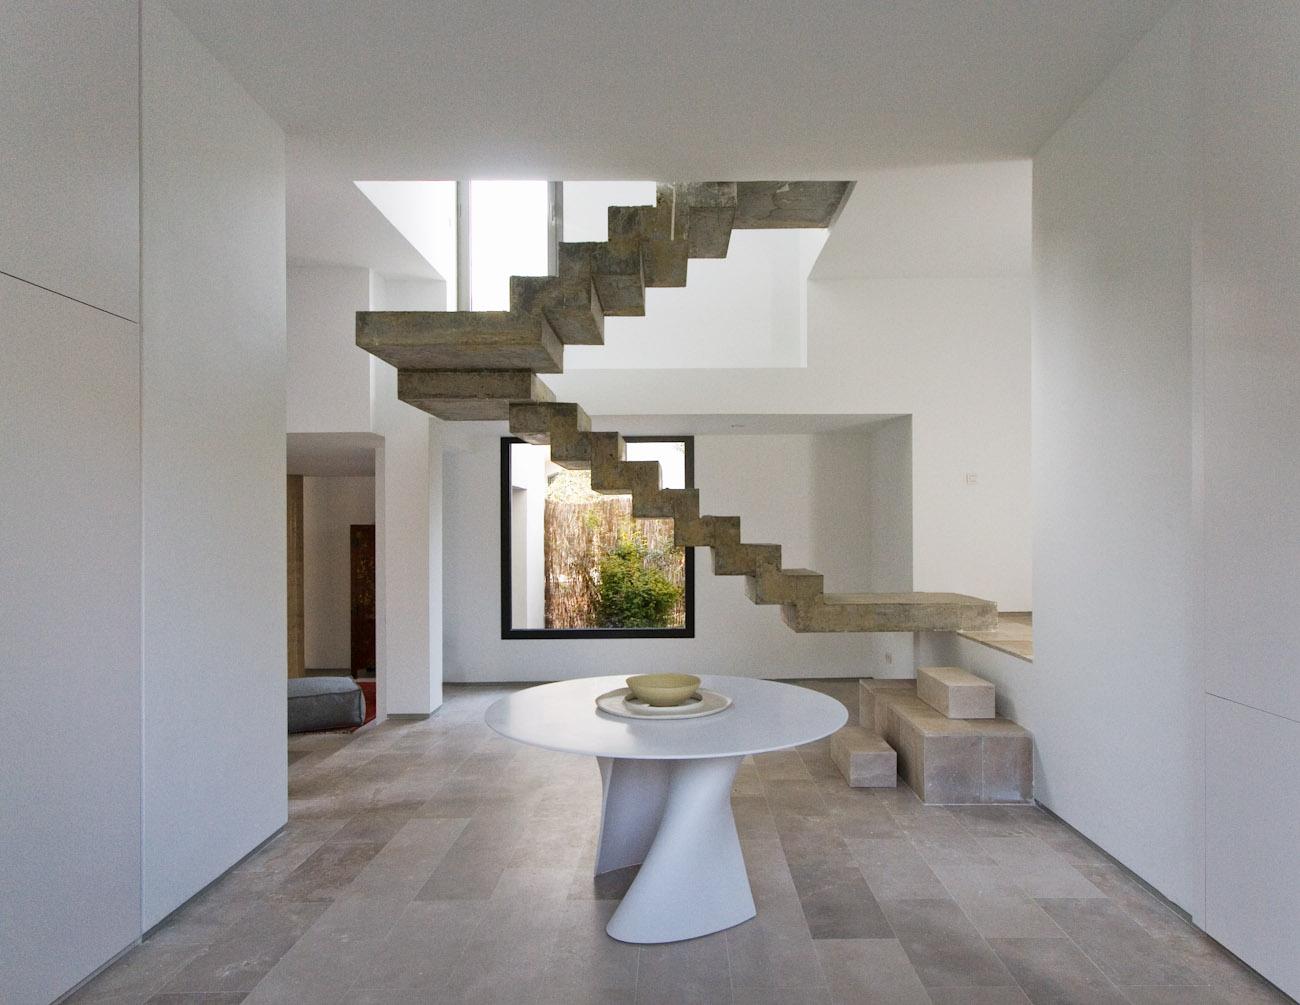 Casa C-51 / Ábaton Arquitectura, © Cortesia da Ábaton Arquitectura